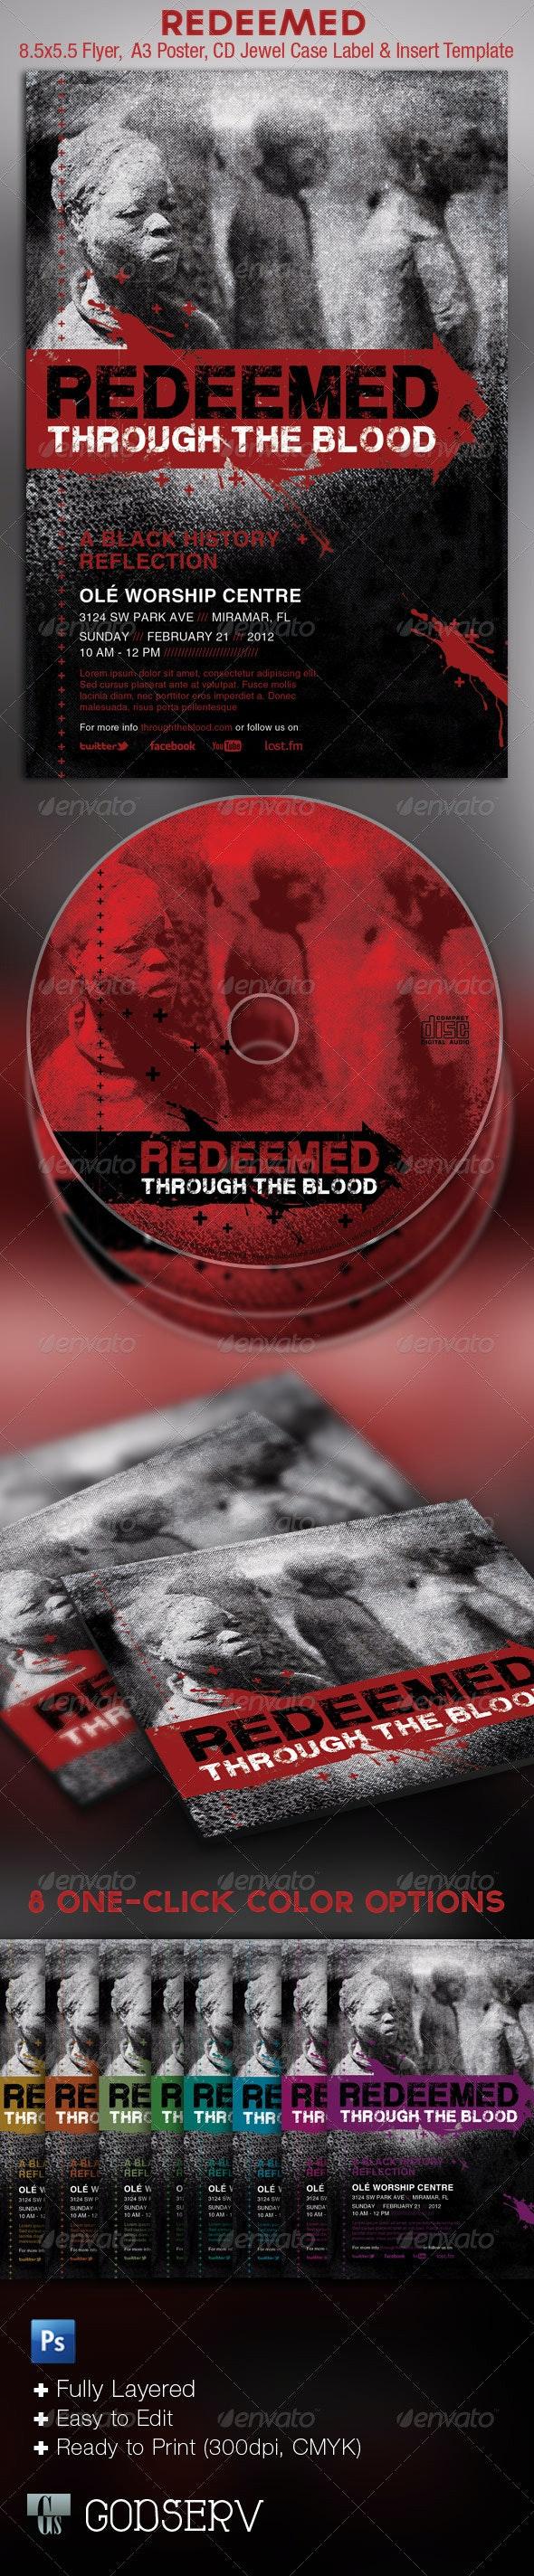 Redeemed Black History Flyer CD Template - Church Flyers